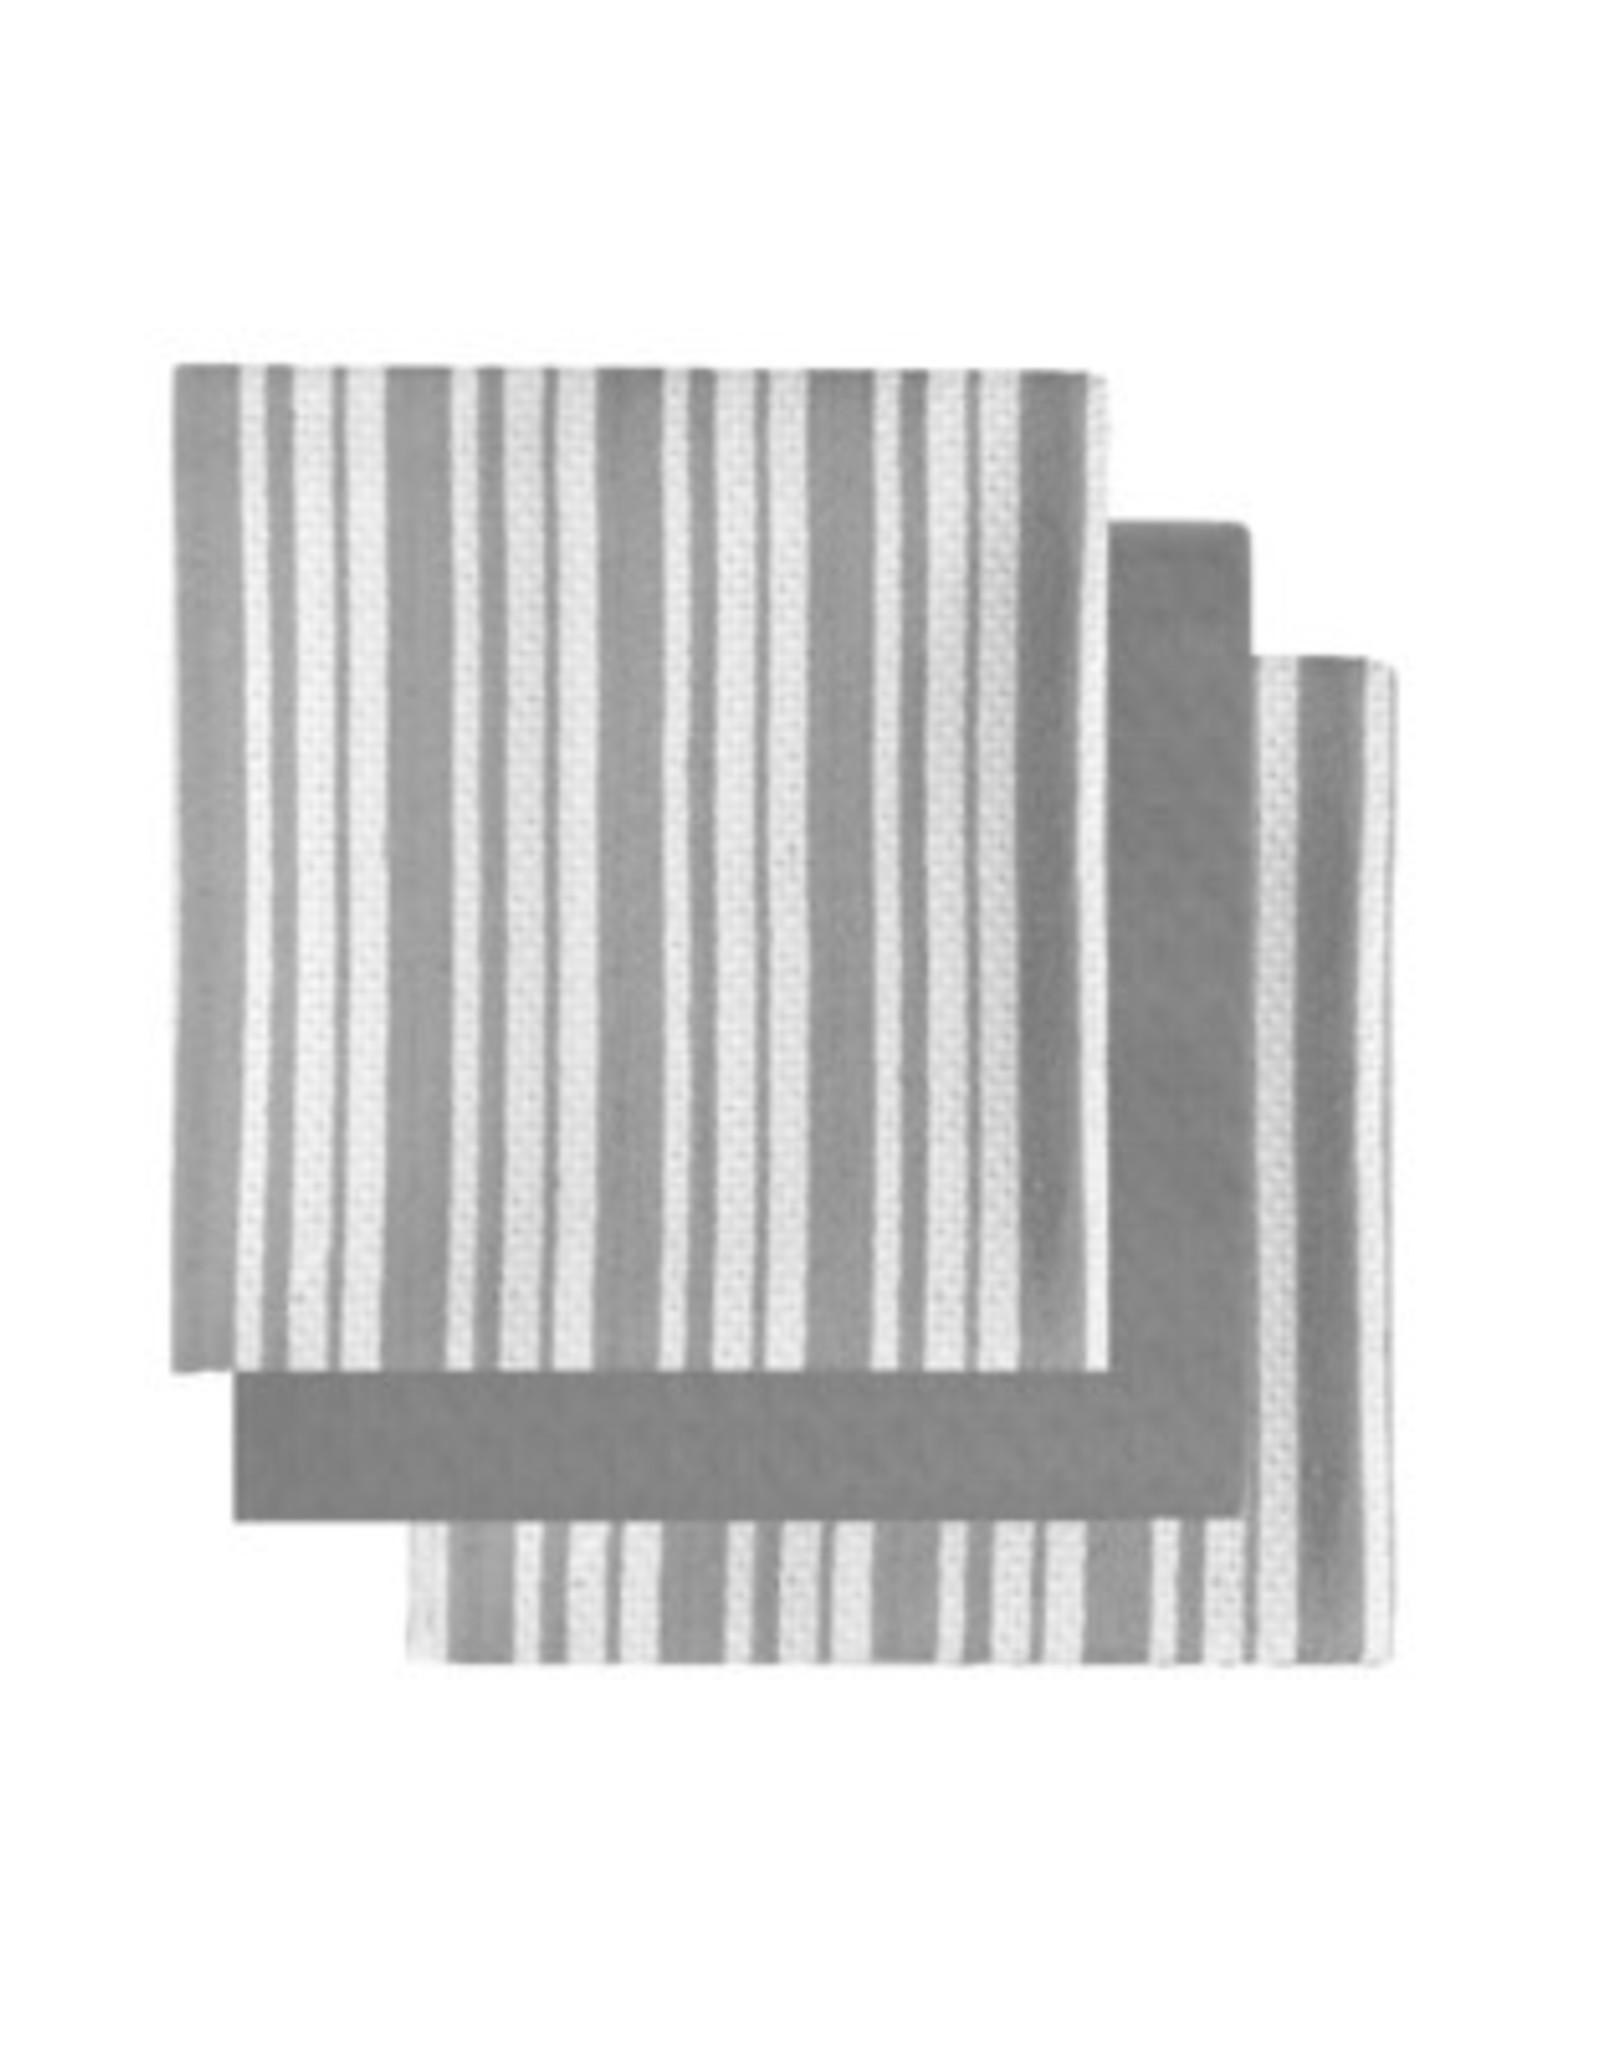 Tea Towel Harman Bistro Basket Set 3 Grey